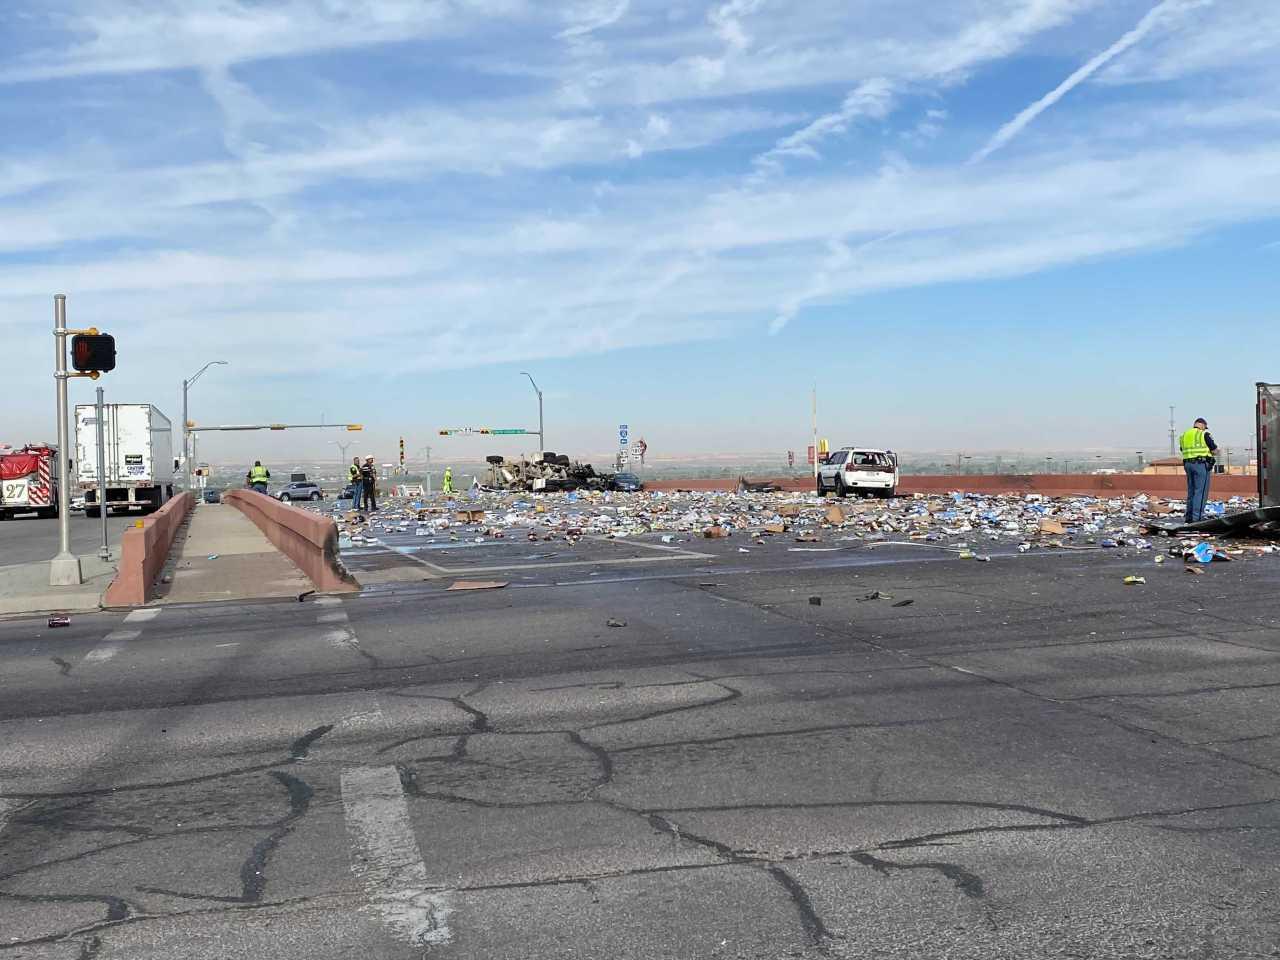 Police: Brake problems likely led to fatal crash